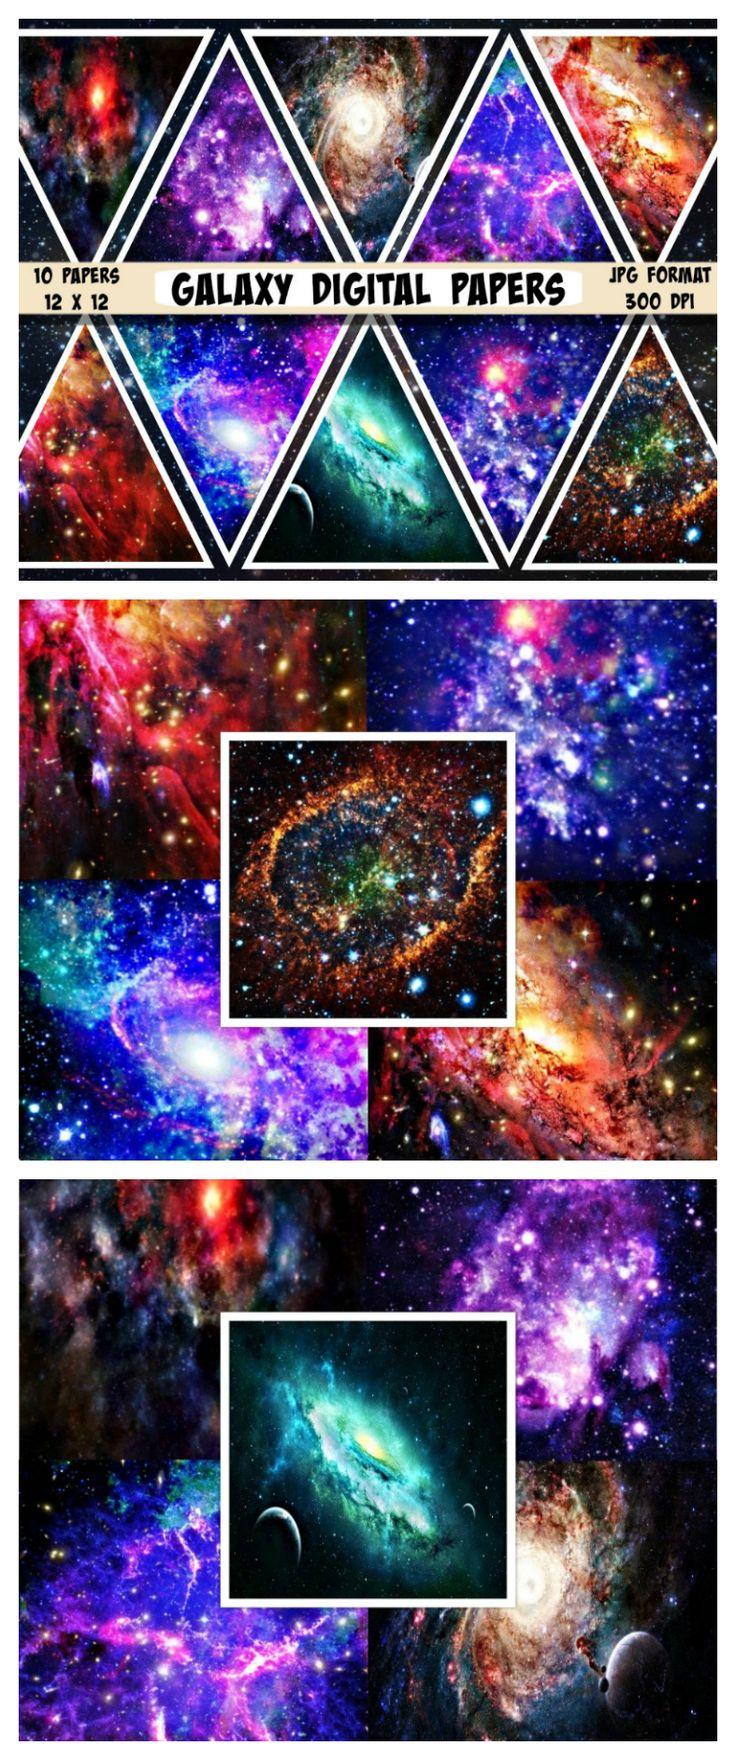 Scrapbook paper england - Galaxy Digital Paper Galaxy Scrapbook Paper Space Paper Outer Space Paper Commercial Use Universe Scrapbook Paper Stars Nebula Paper